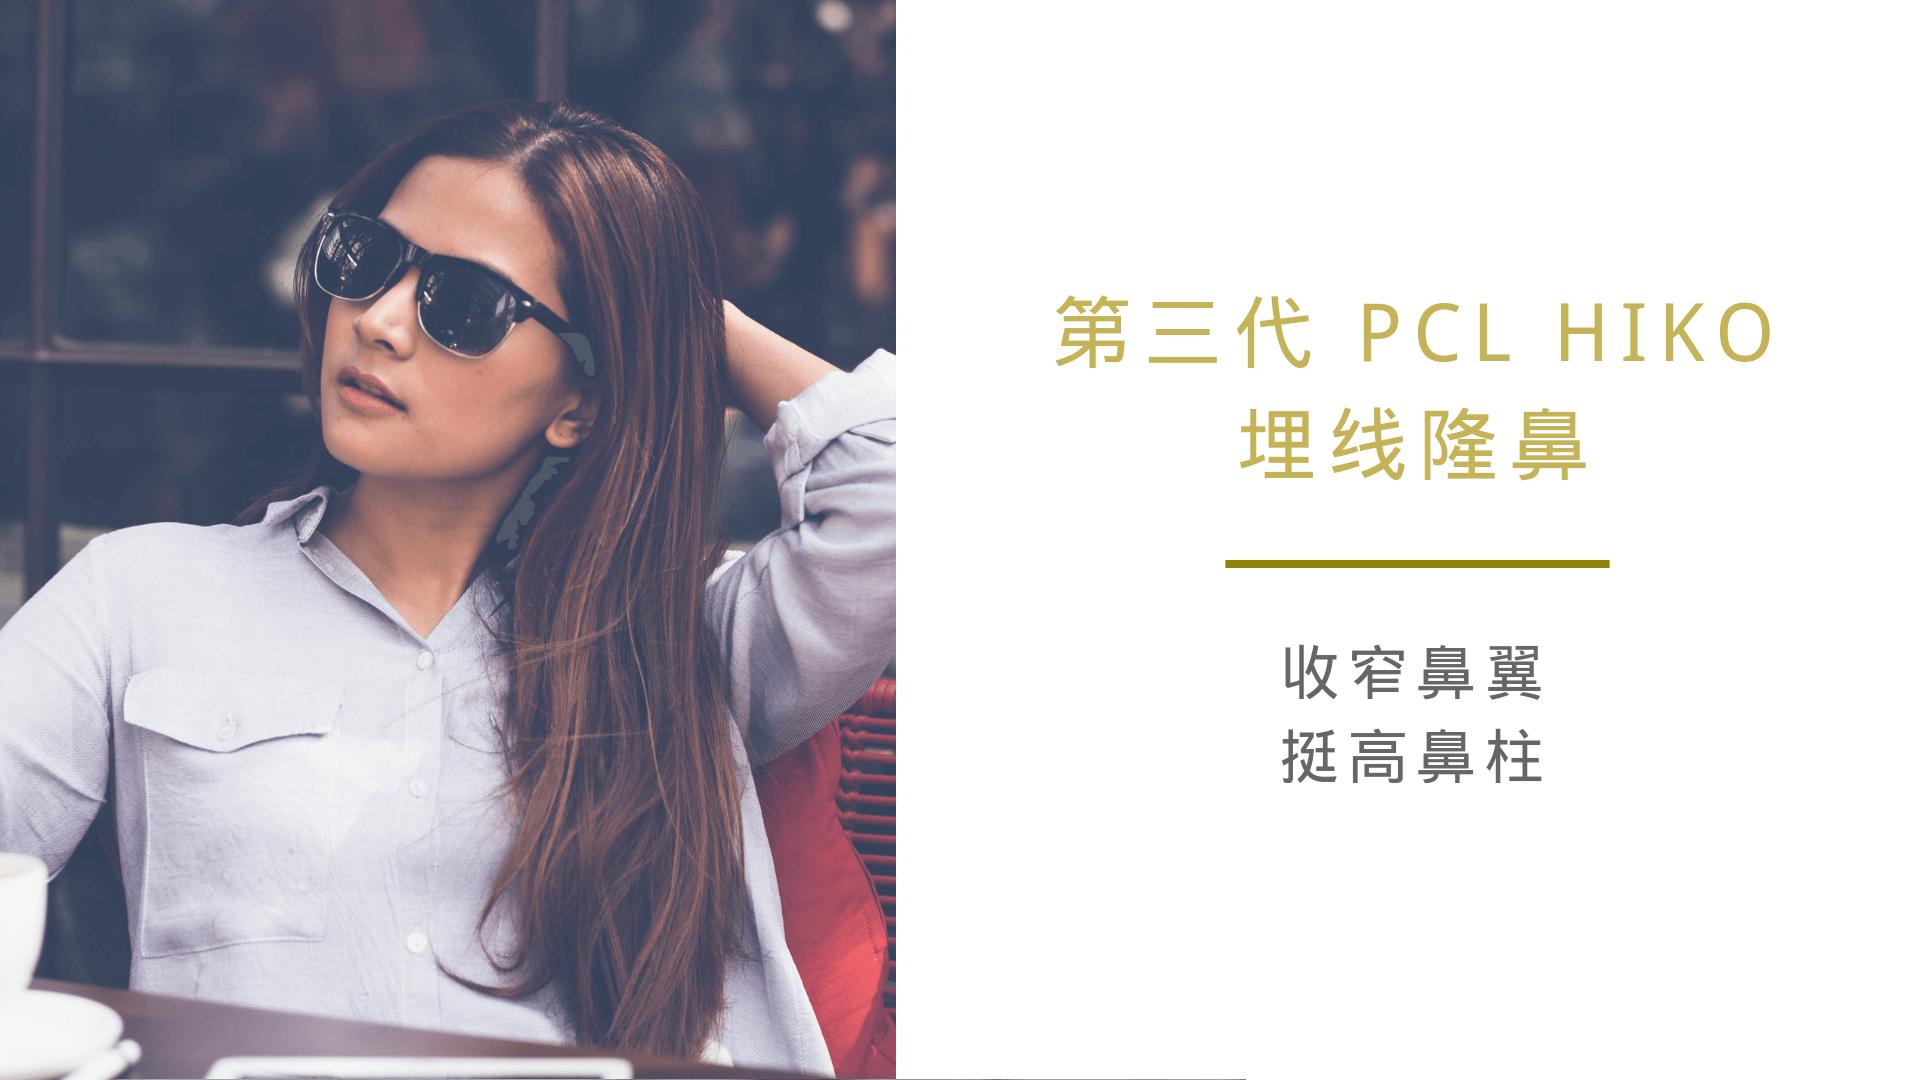 PCL Hiko 第三代埋线隆鼻